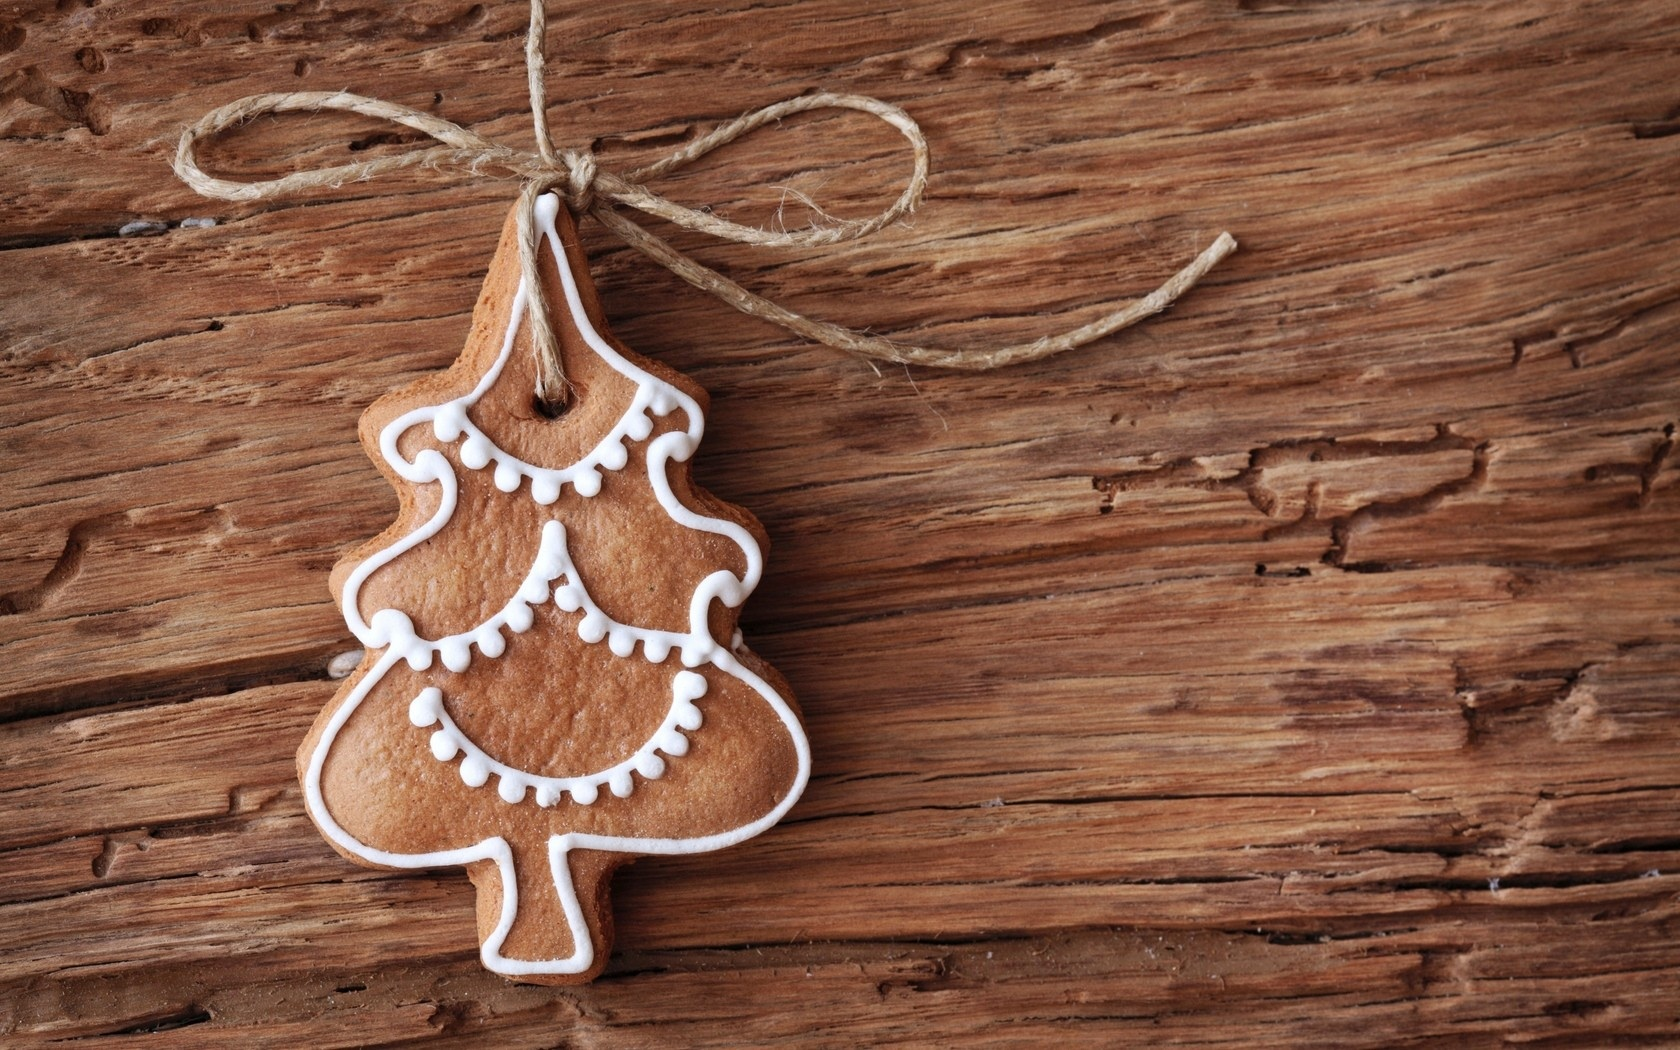 Best Wallpaper Christmas Wood - beautiful-Christmas-tree-wallpaper-30  You Should Have_486535 .jpg